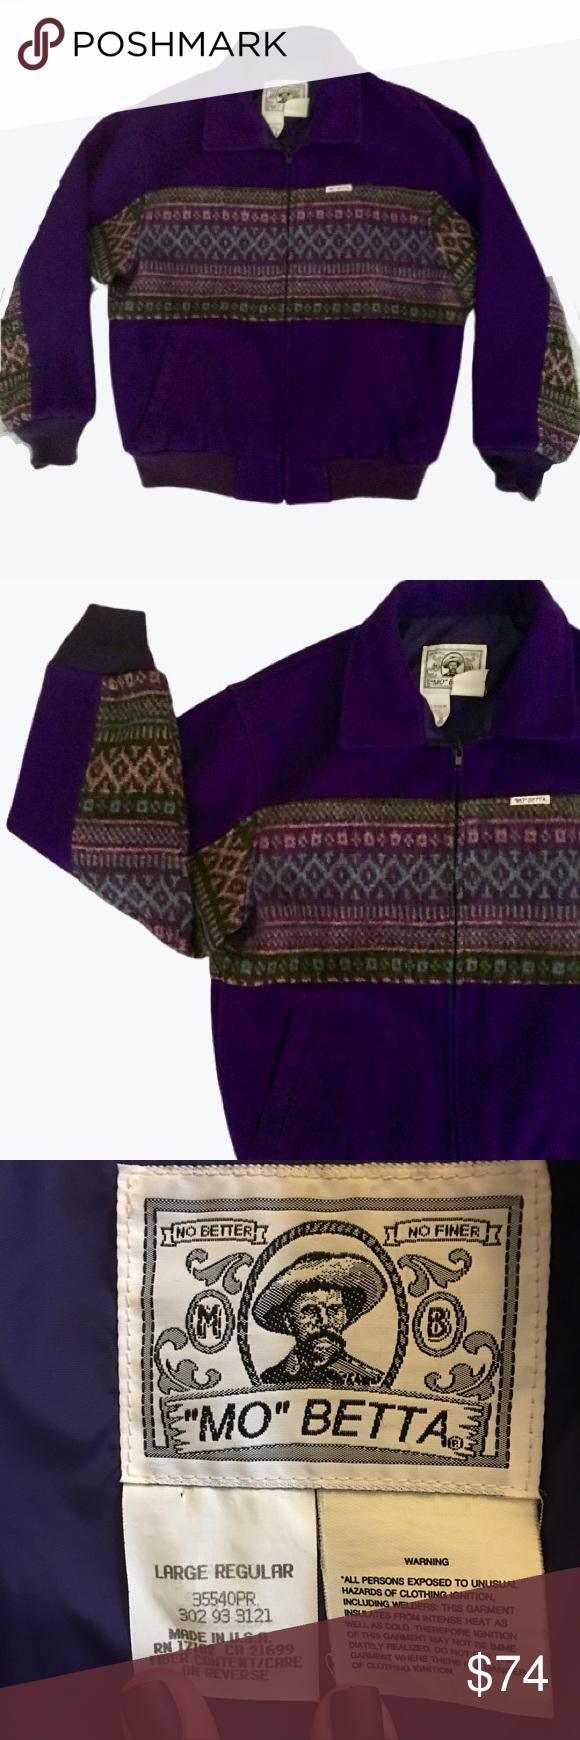 90 S Mo Betta Rare Purple Navajo Bomber Jacket Bomber Jacket Vintage Vintage Jacket Bomber Jacket [ 1740 x 580 Pixel ]